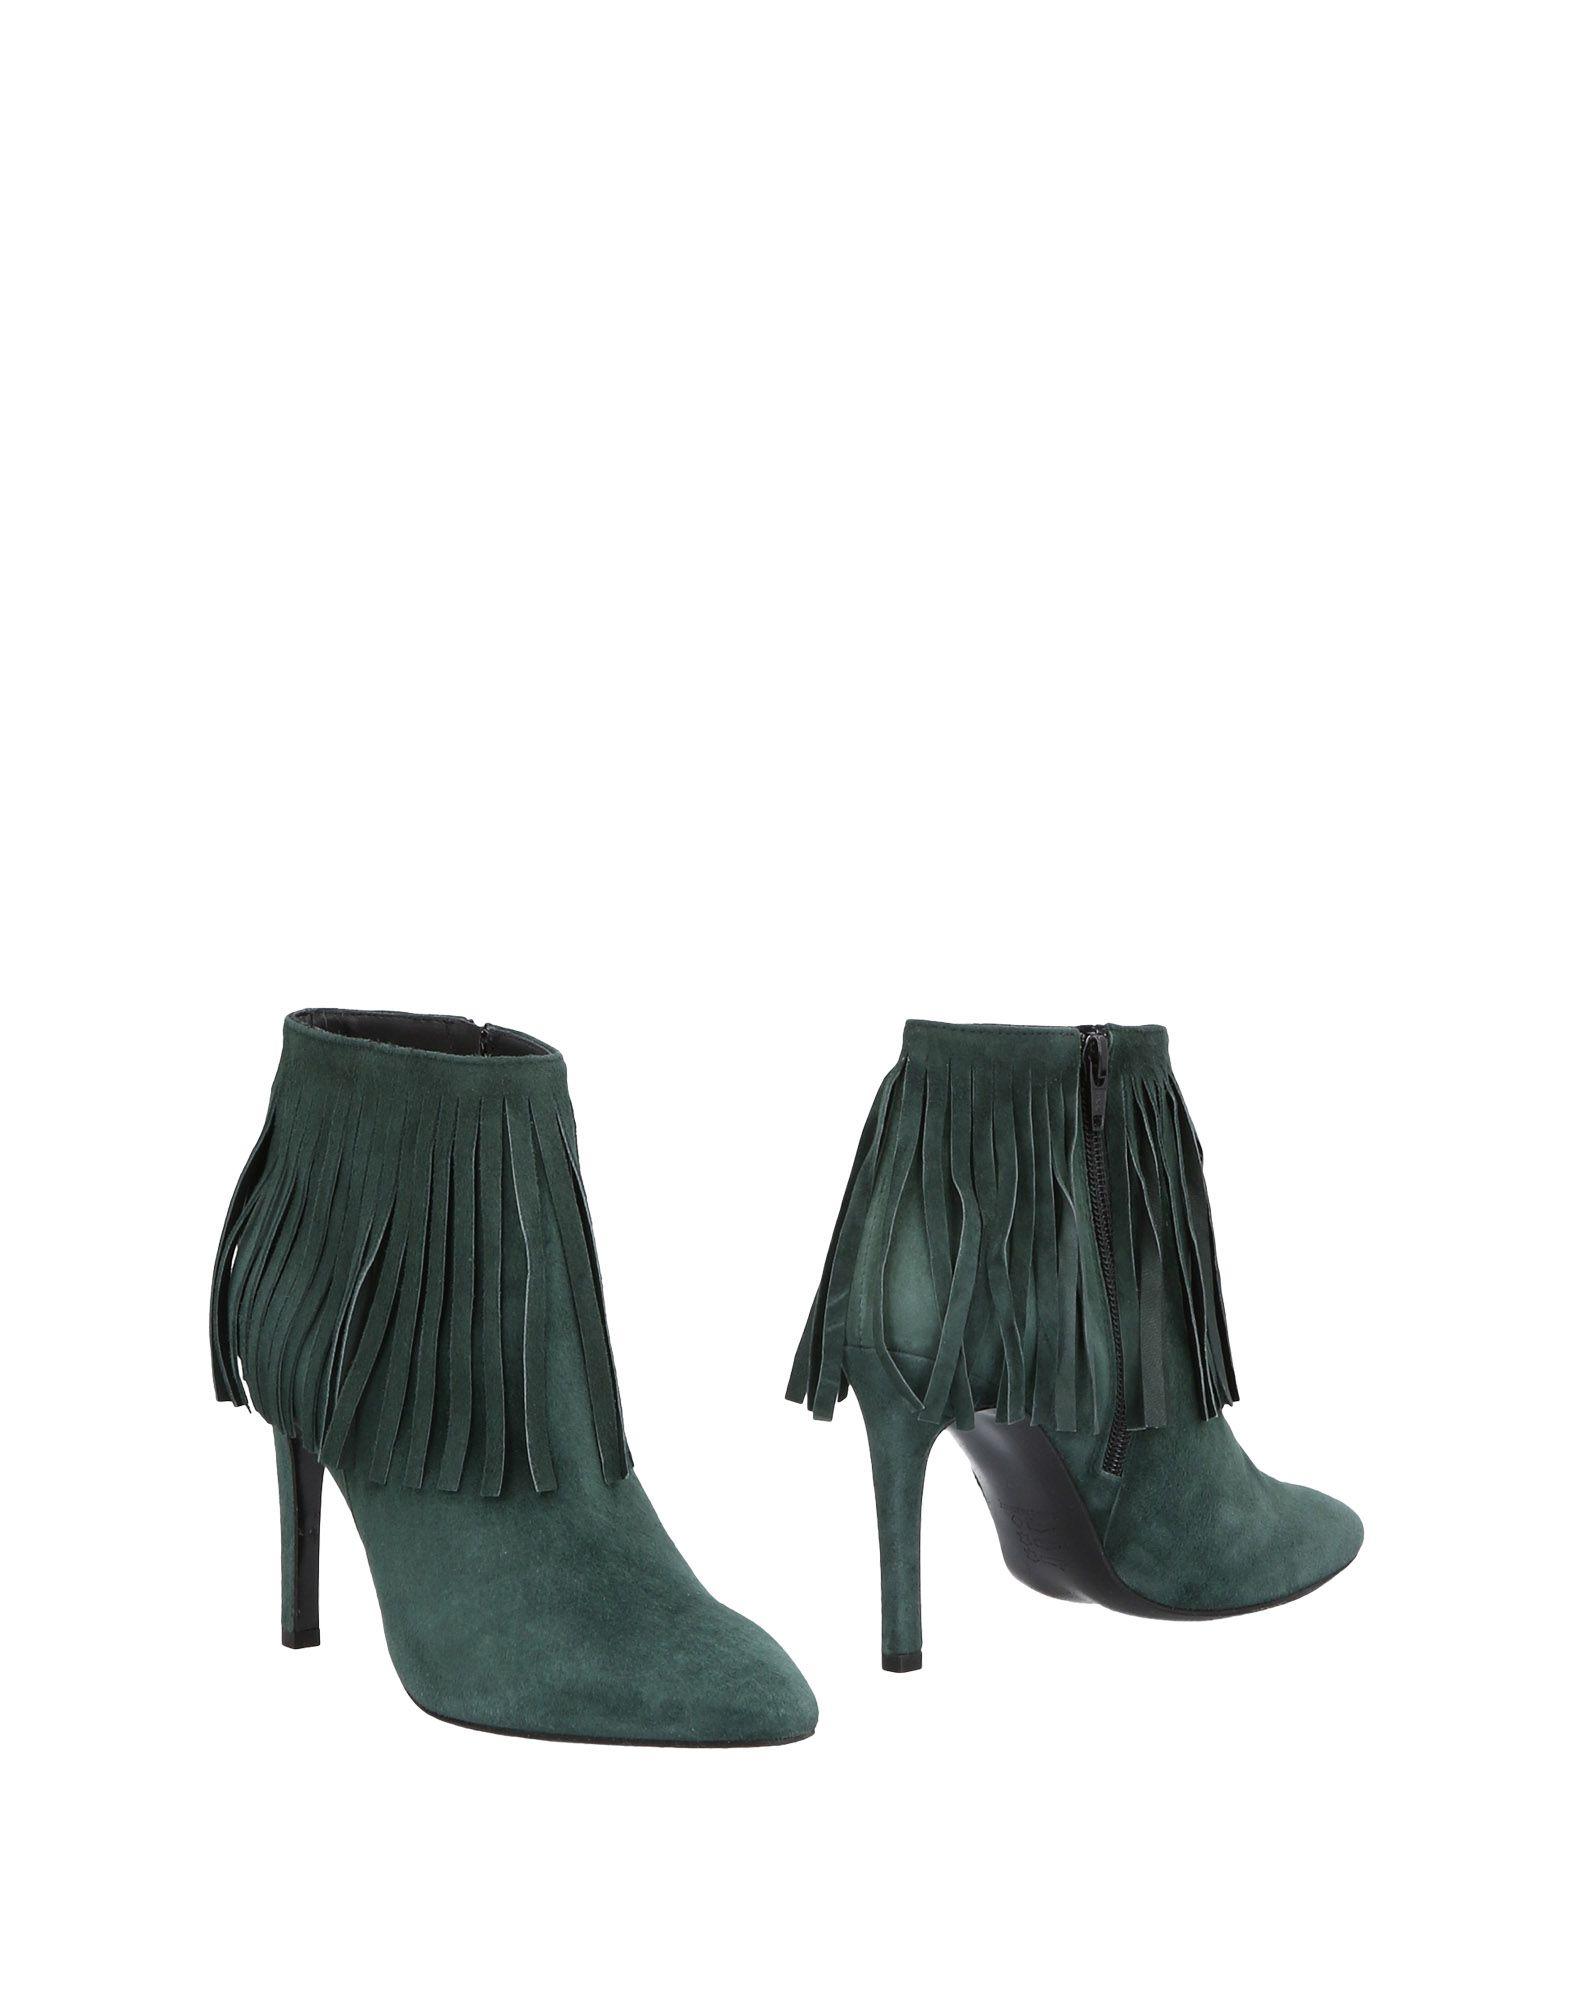 Islo Isabella Lorusso Schuhe Stiefelette Damen  11189016EM Neue Schuhe Lorusso 4ec739